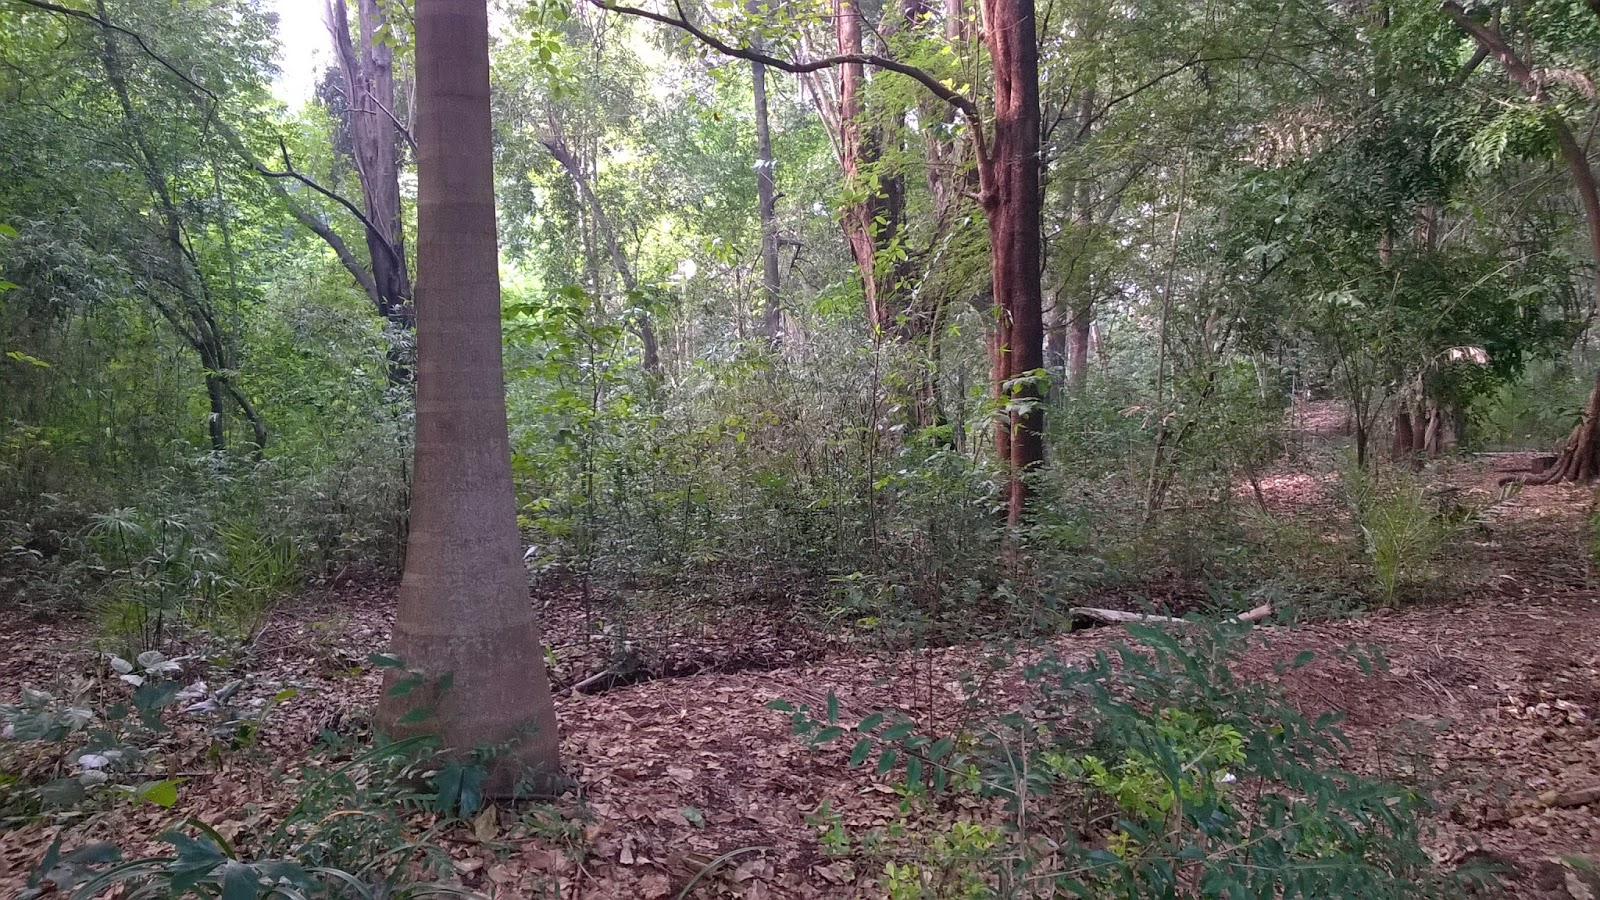 Alice garden, University, forest